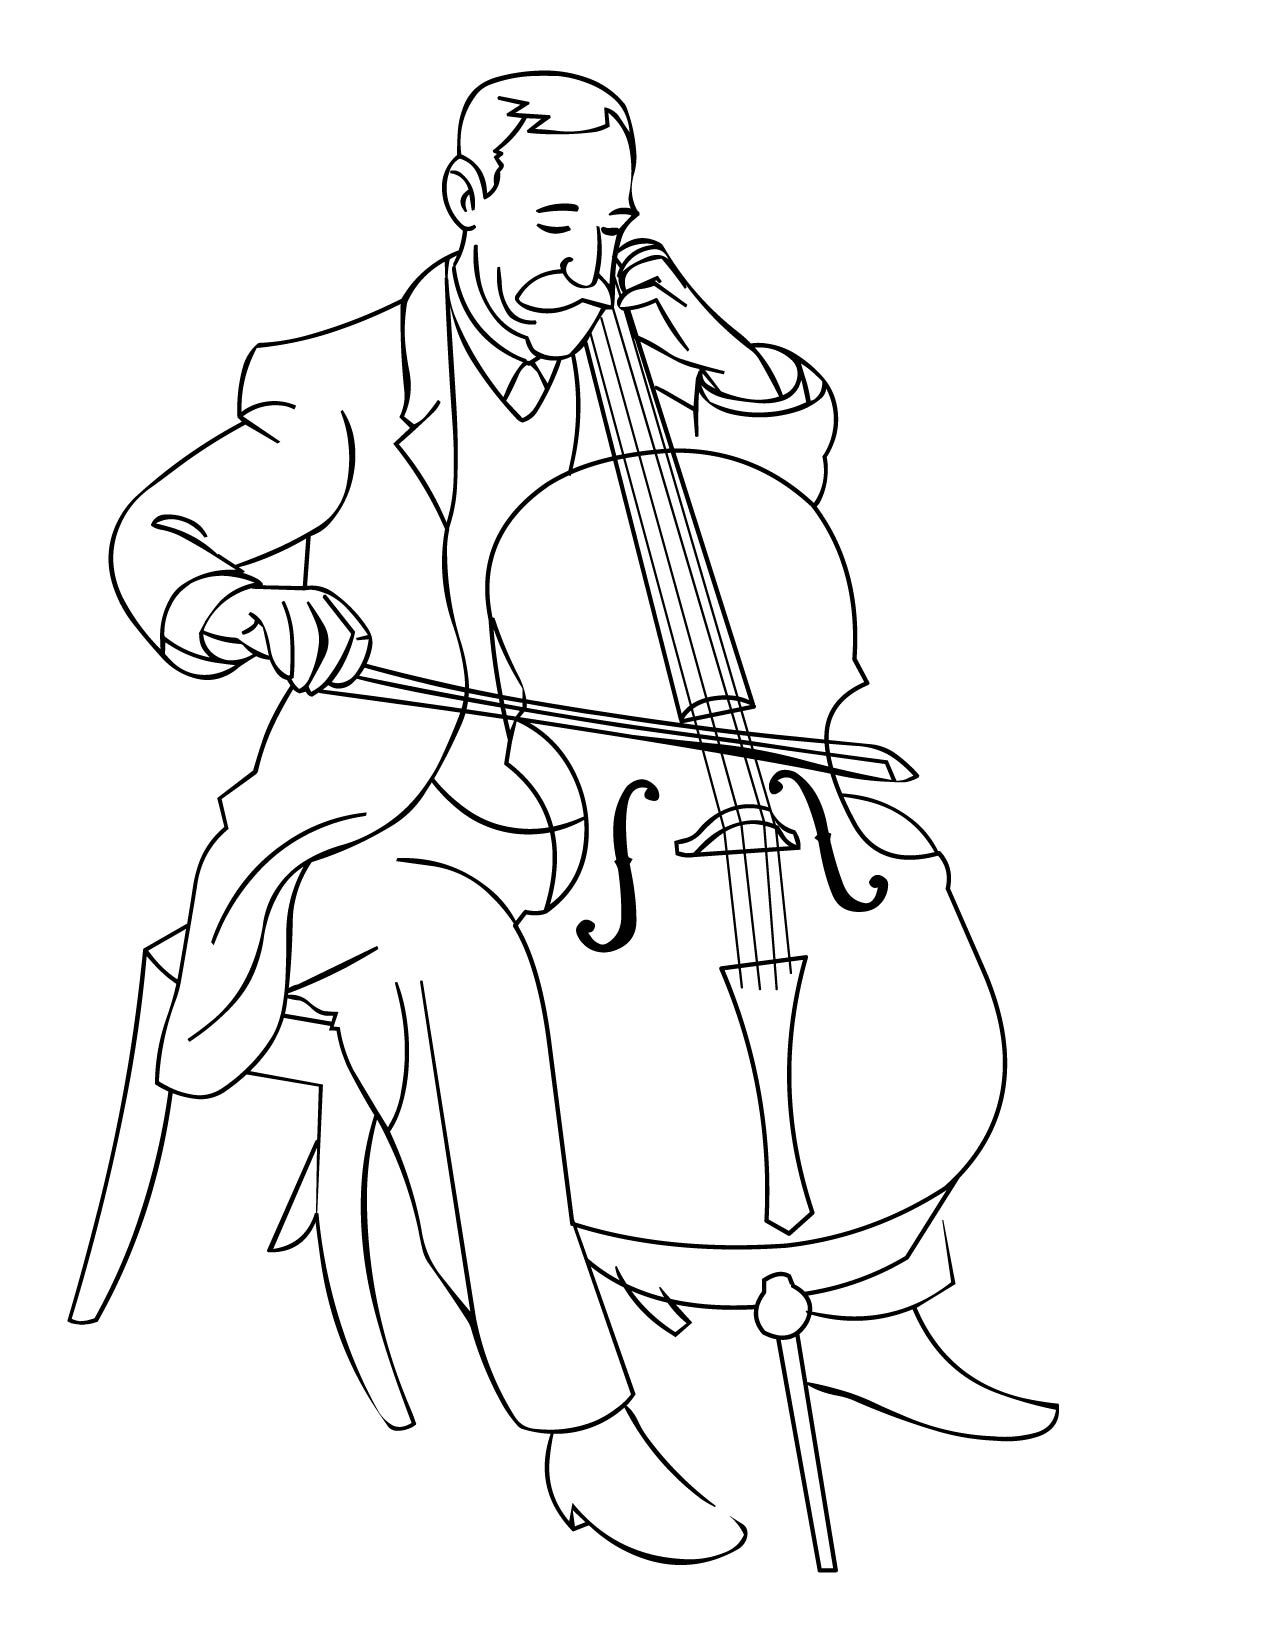 Orchestra Cello Coloring Page